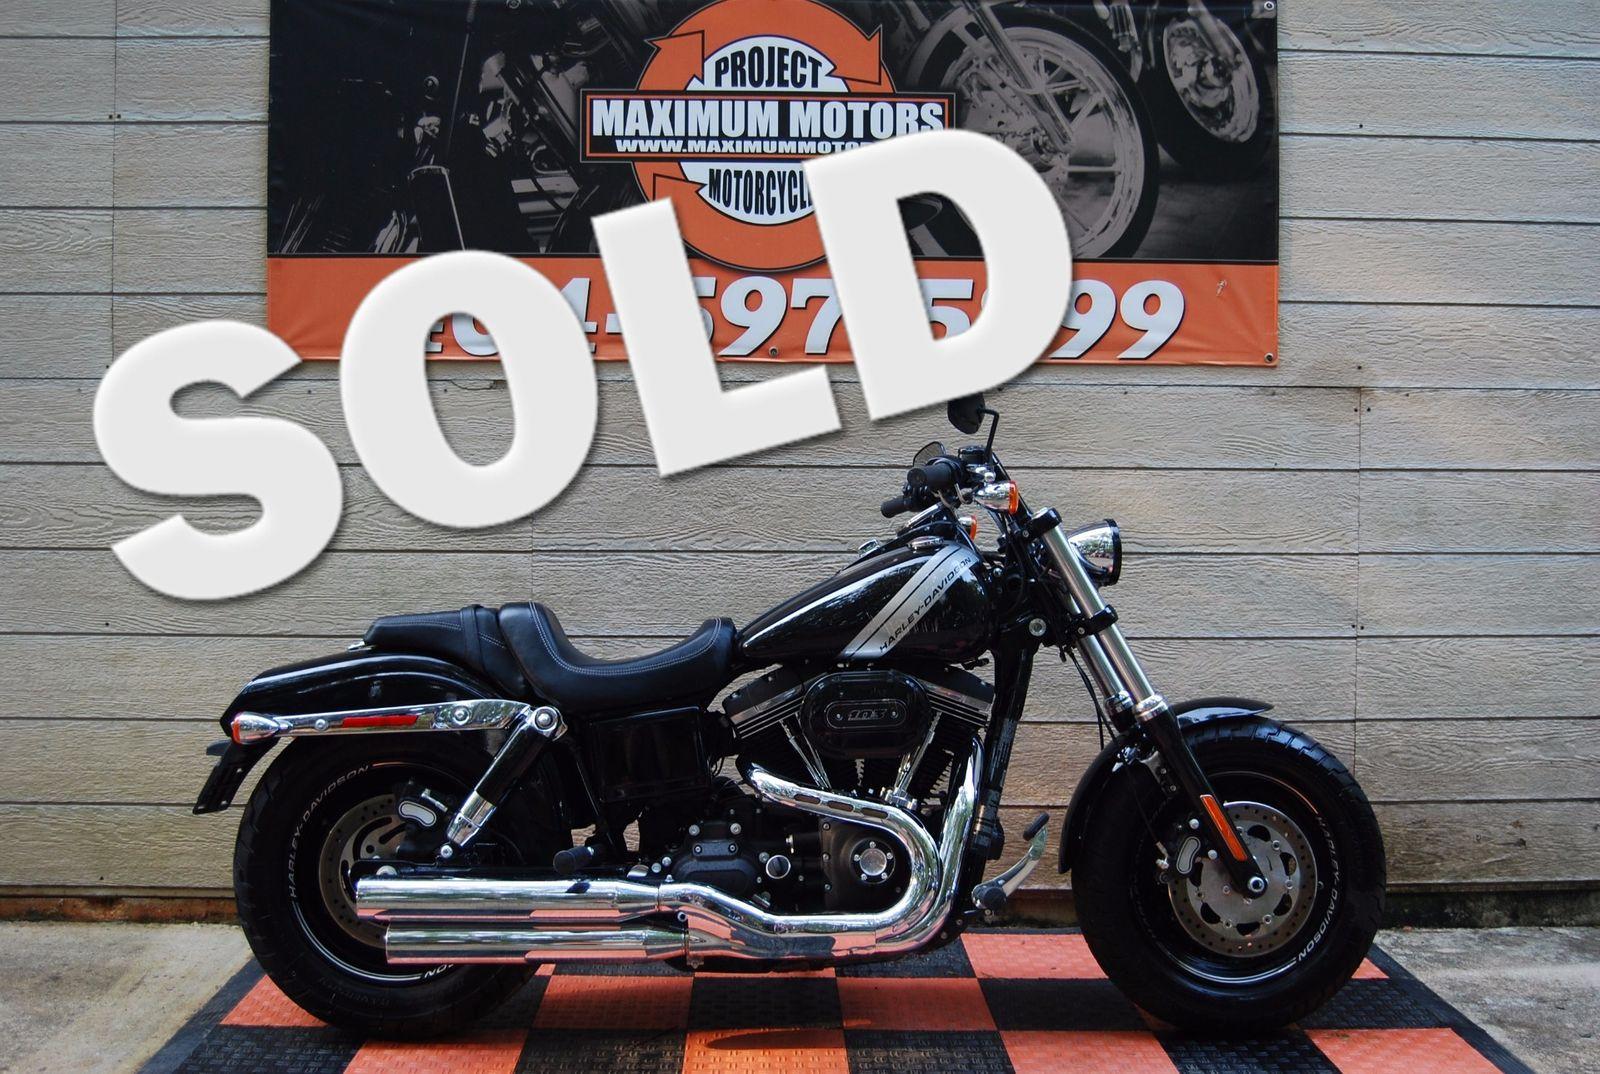 Harley-Davidson Dyna®  2017 FXDF Dyna Fat Bob Like New 899 miles Very Minor Salvge Damage- We Ship !!!